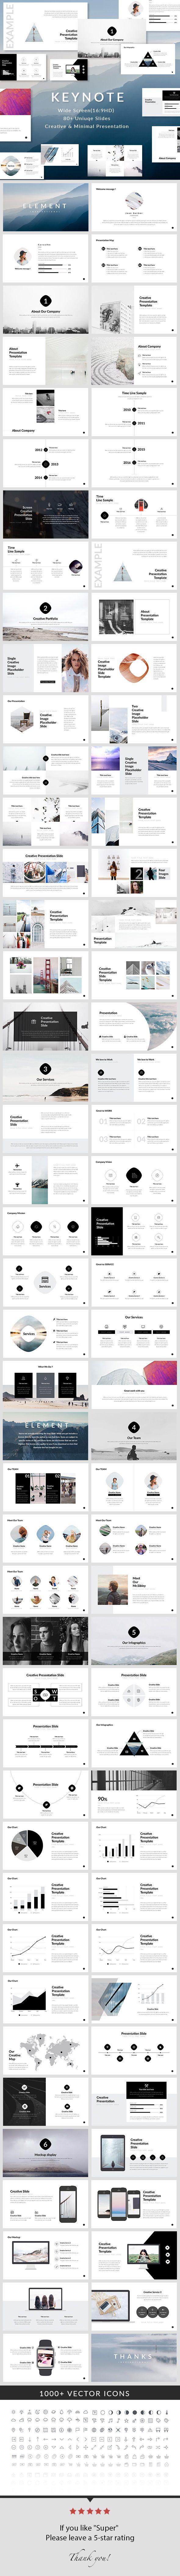 Element - Keynote Presentation Template